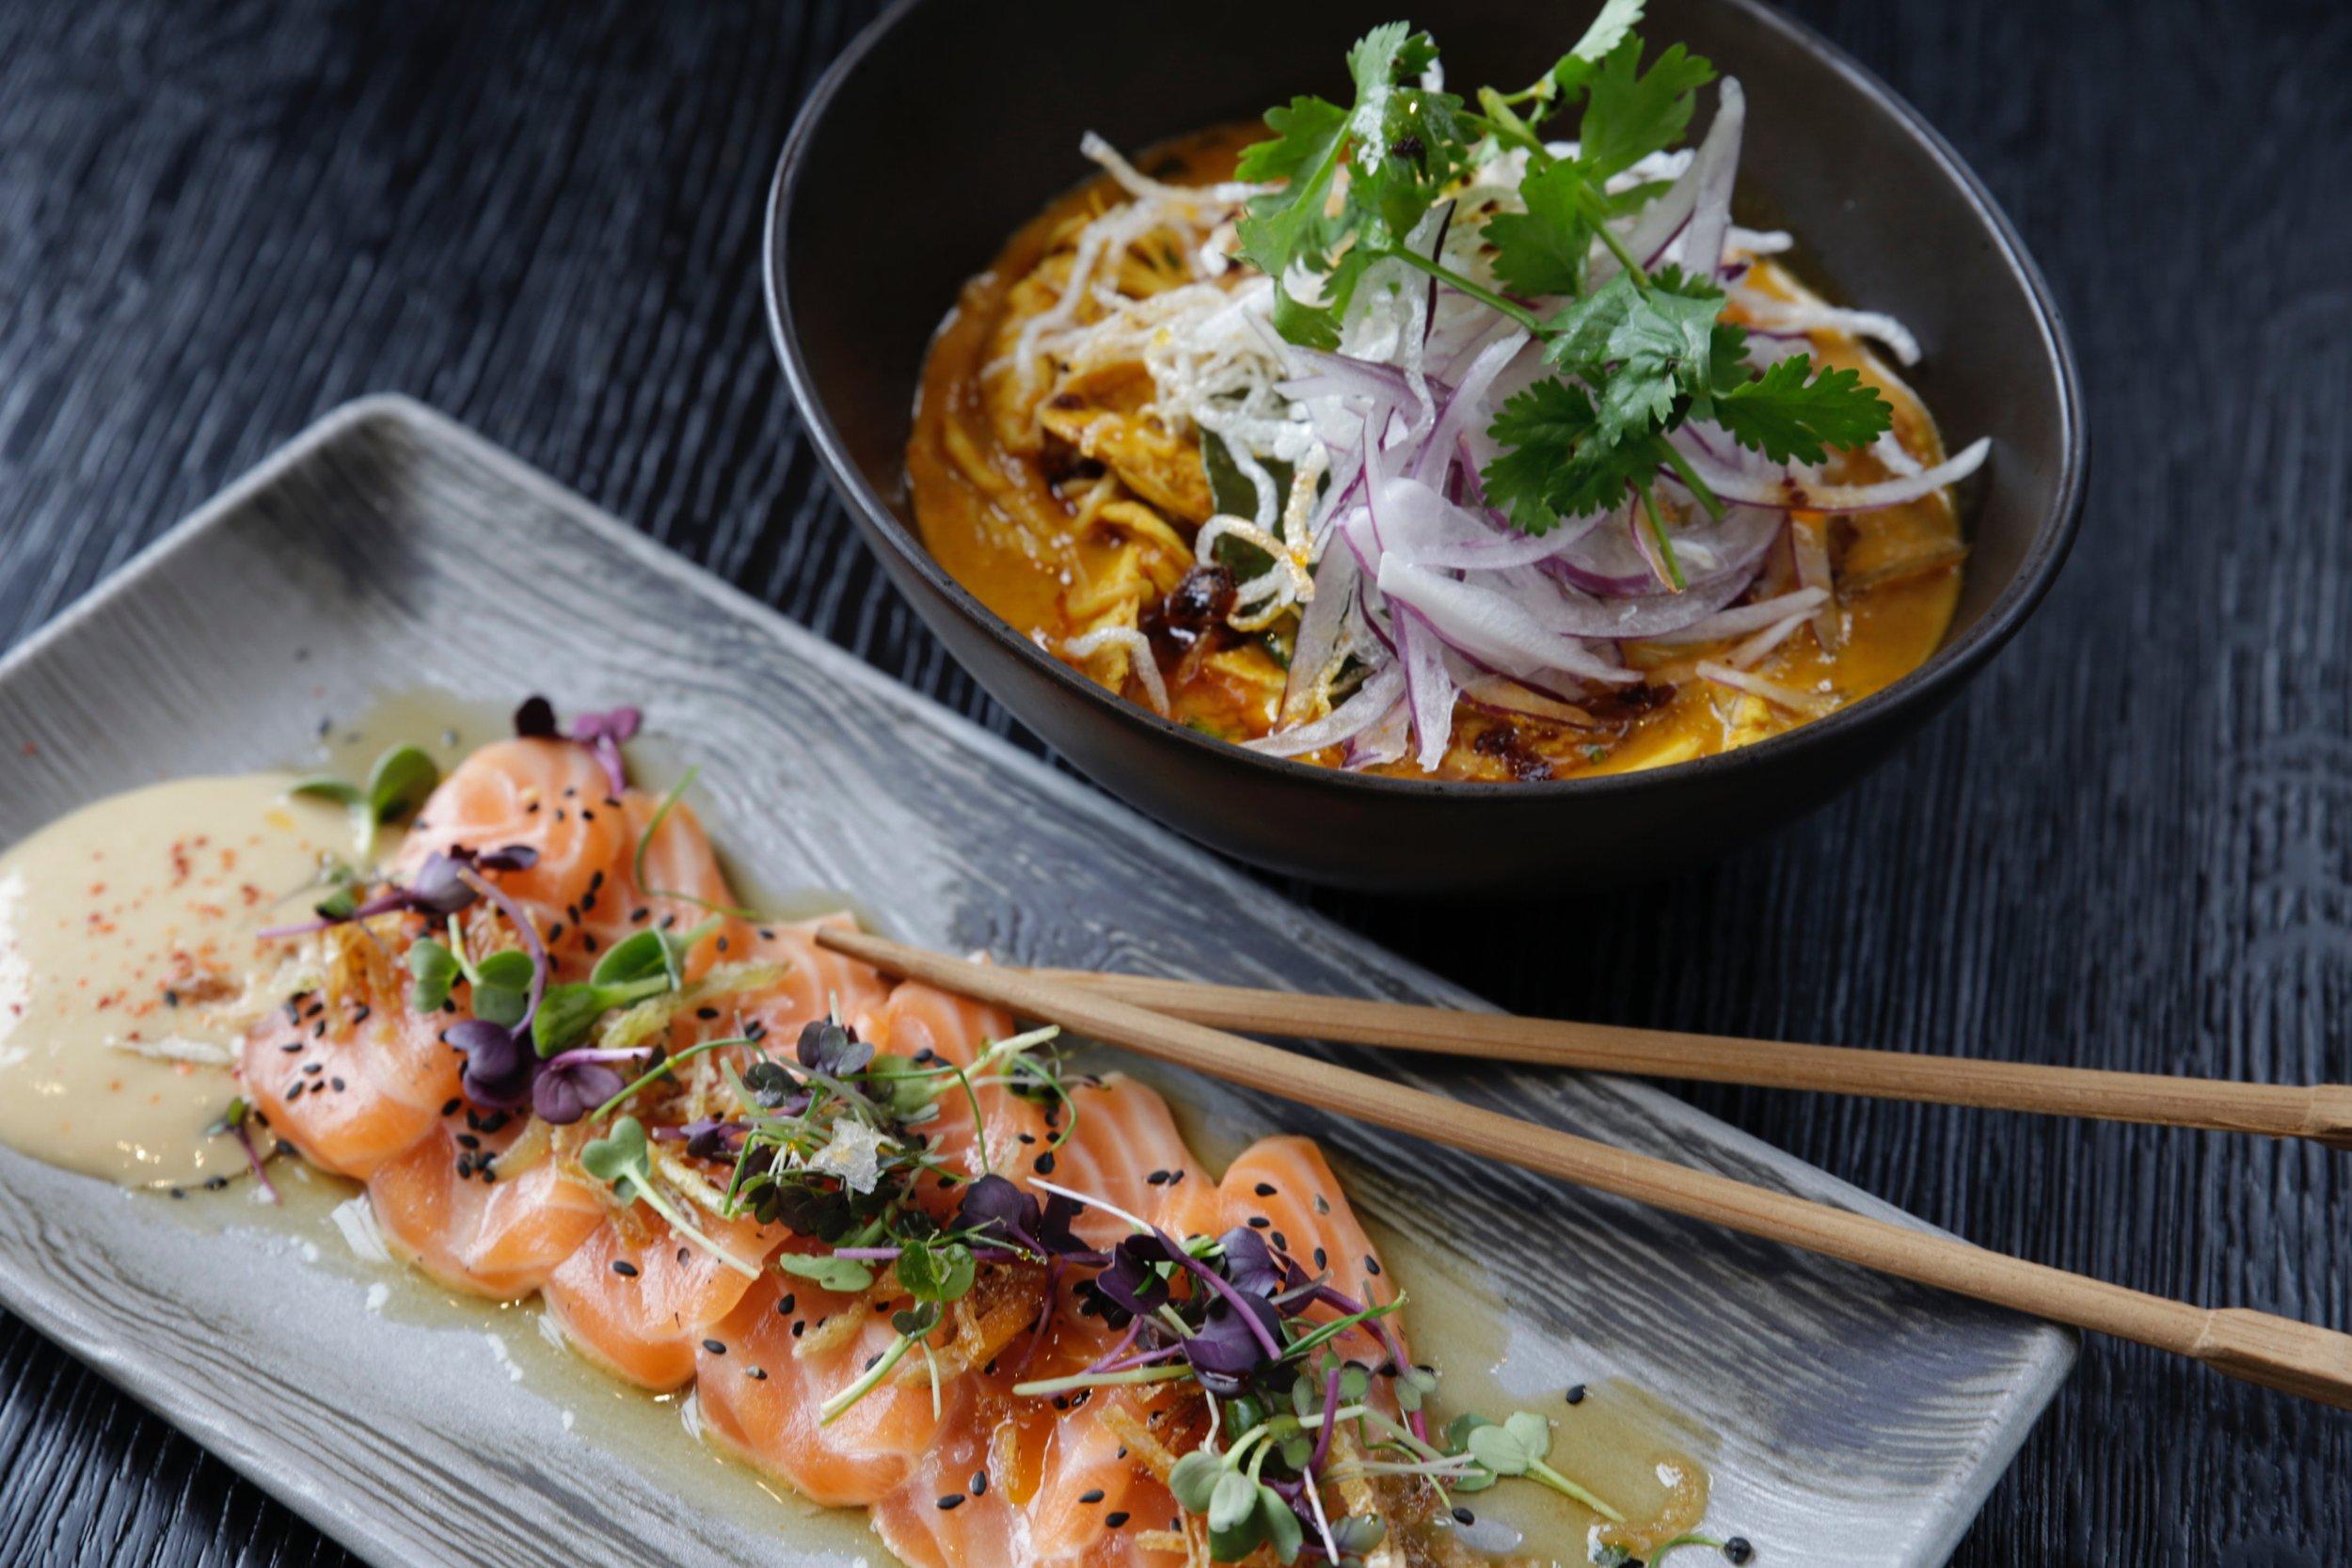 asian-food-bowl-chopsticks-628776.jpg